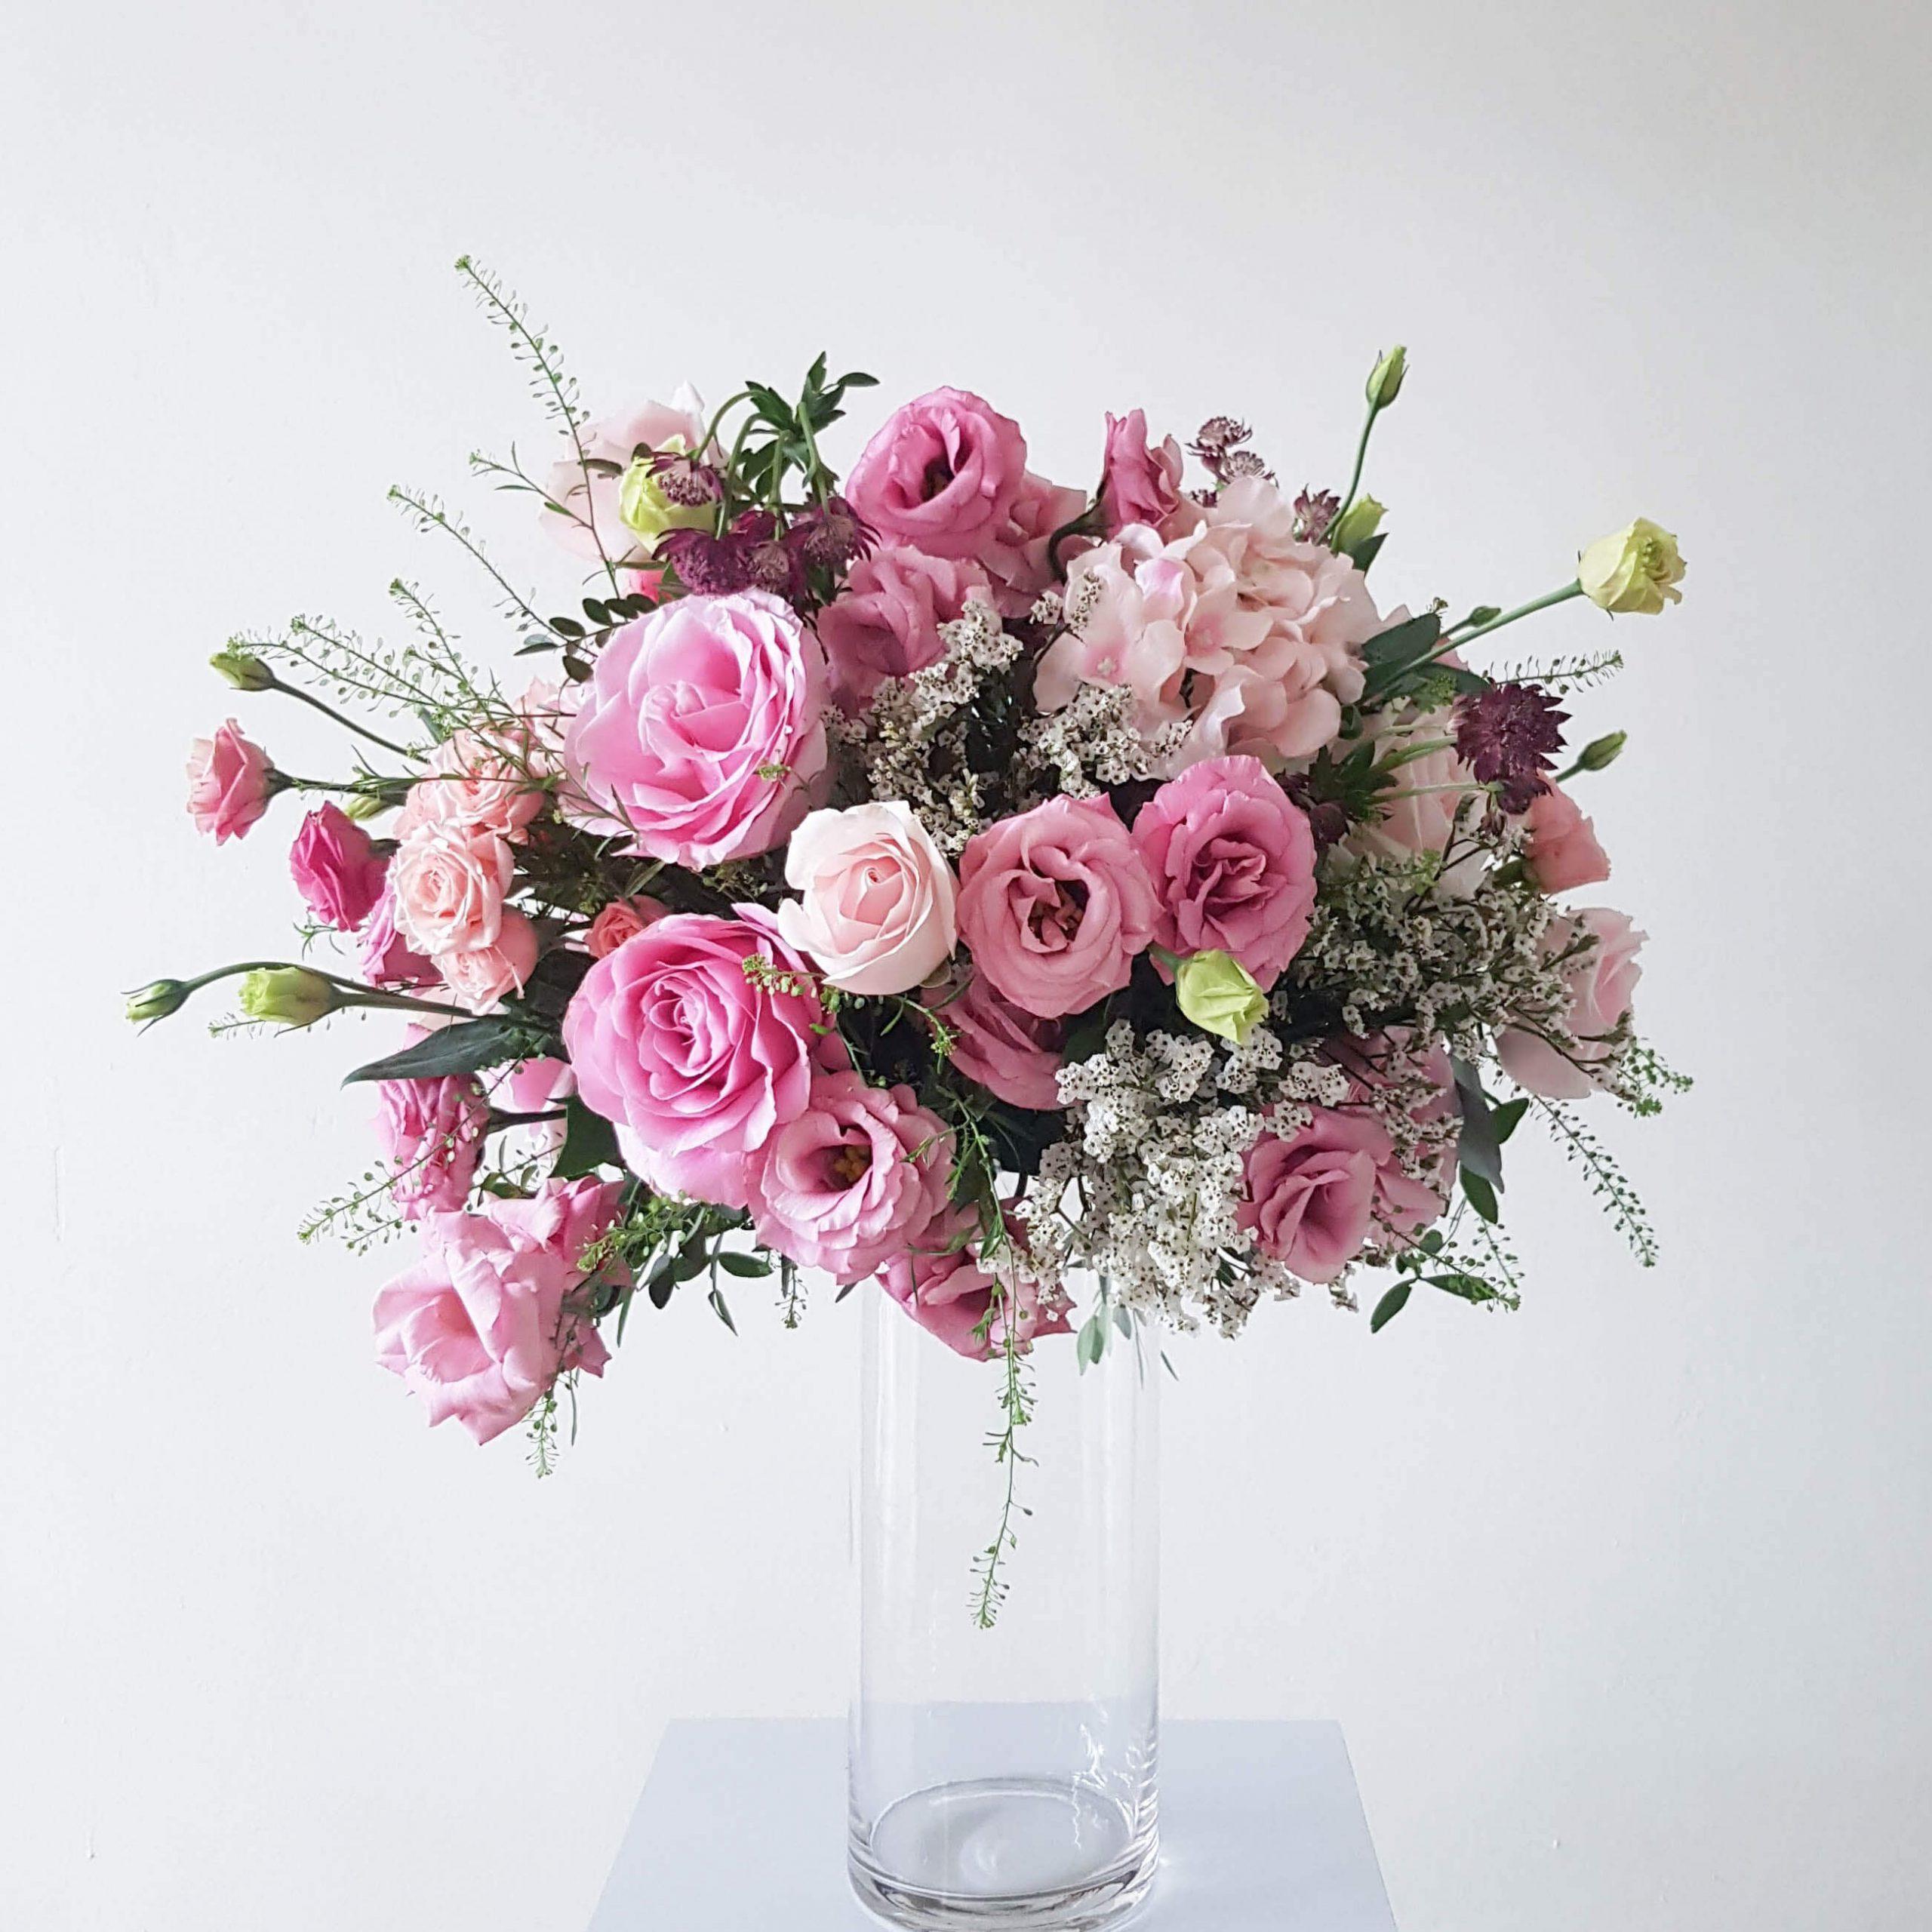 Big Flower In Vase My Sweety Vase Arrangement Afterrainflorist